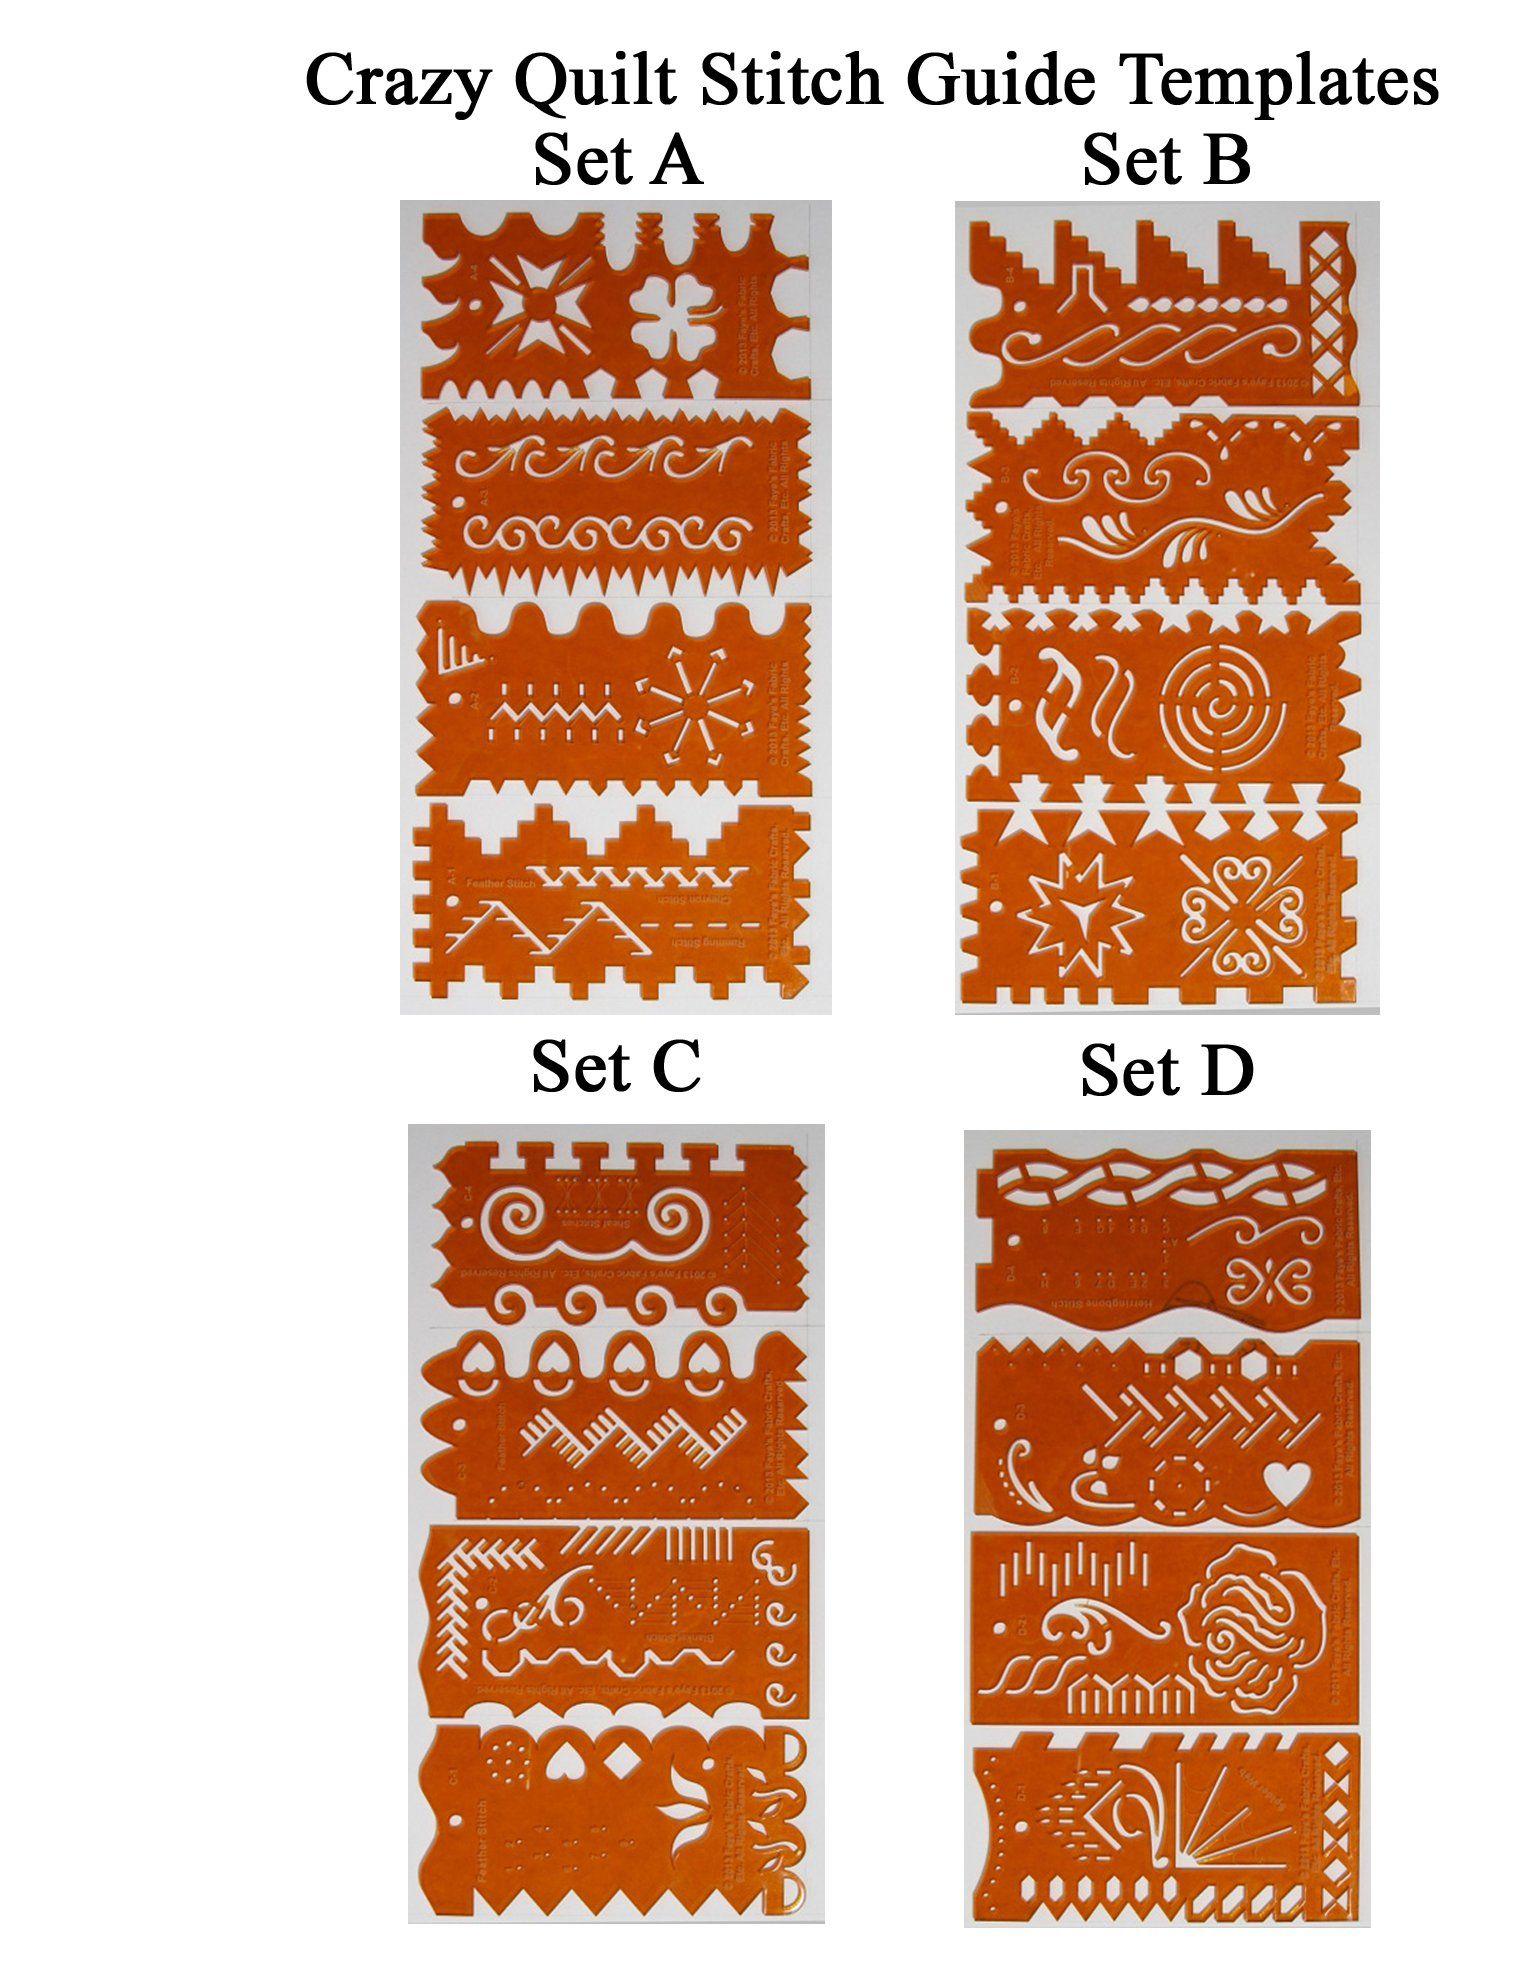 Fayes fabric crafts etc crazy quilt stitch guide templates hussif fayes fabric crafts etc crazy quilt stitch guide templates maxwellsz